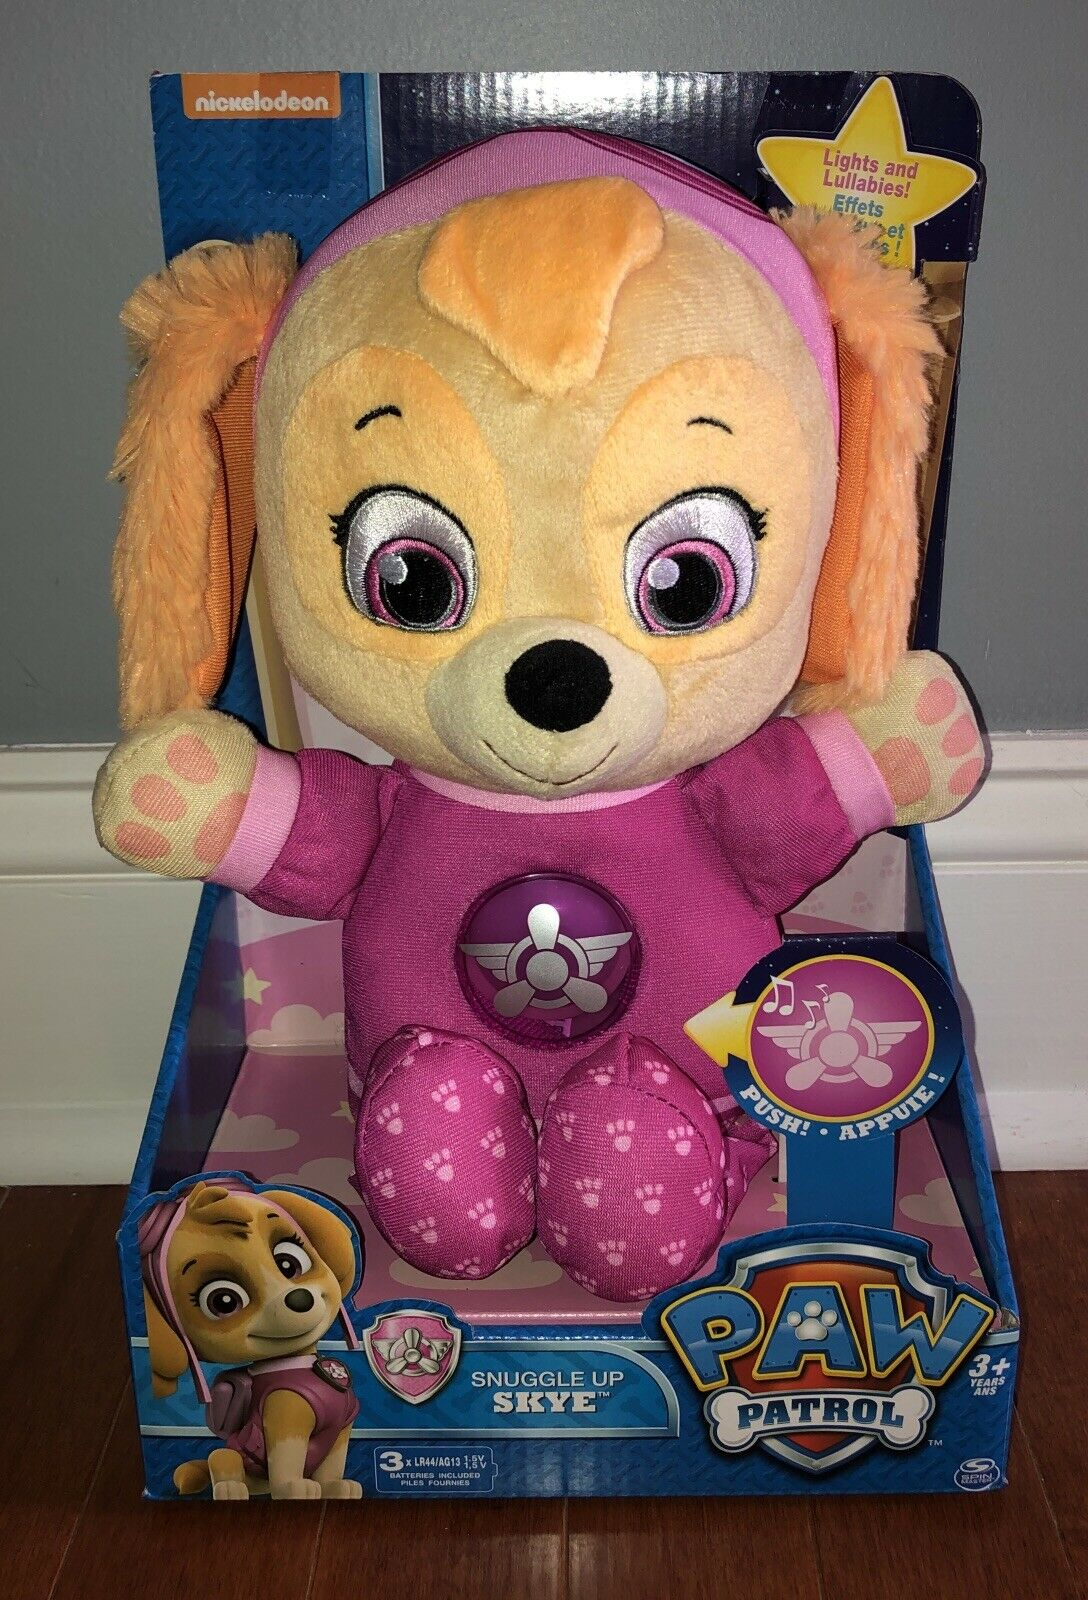 Paw Patrol Snuggle Up Lights and Sounds Skye Doll Plush Toy New Night light 2019